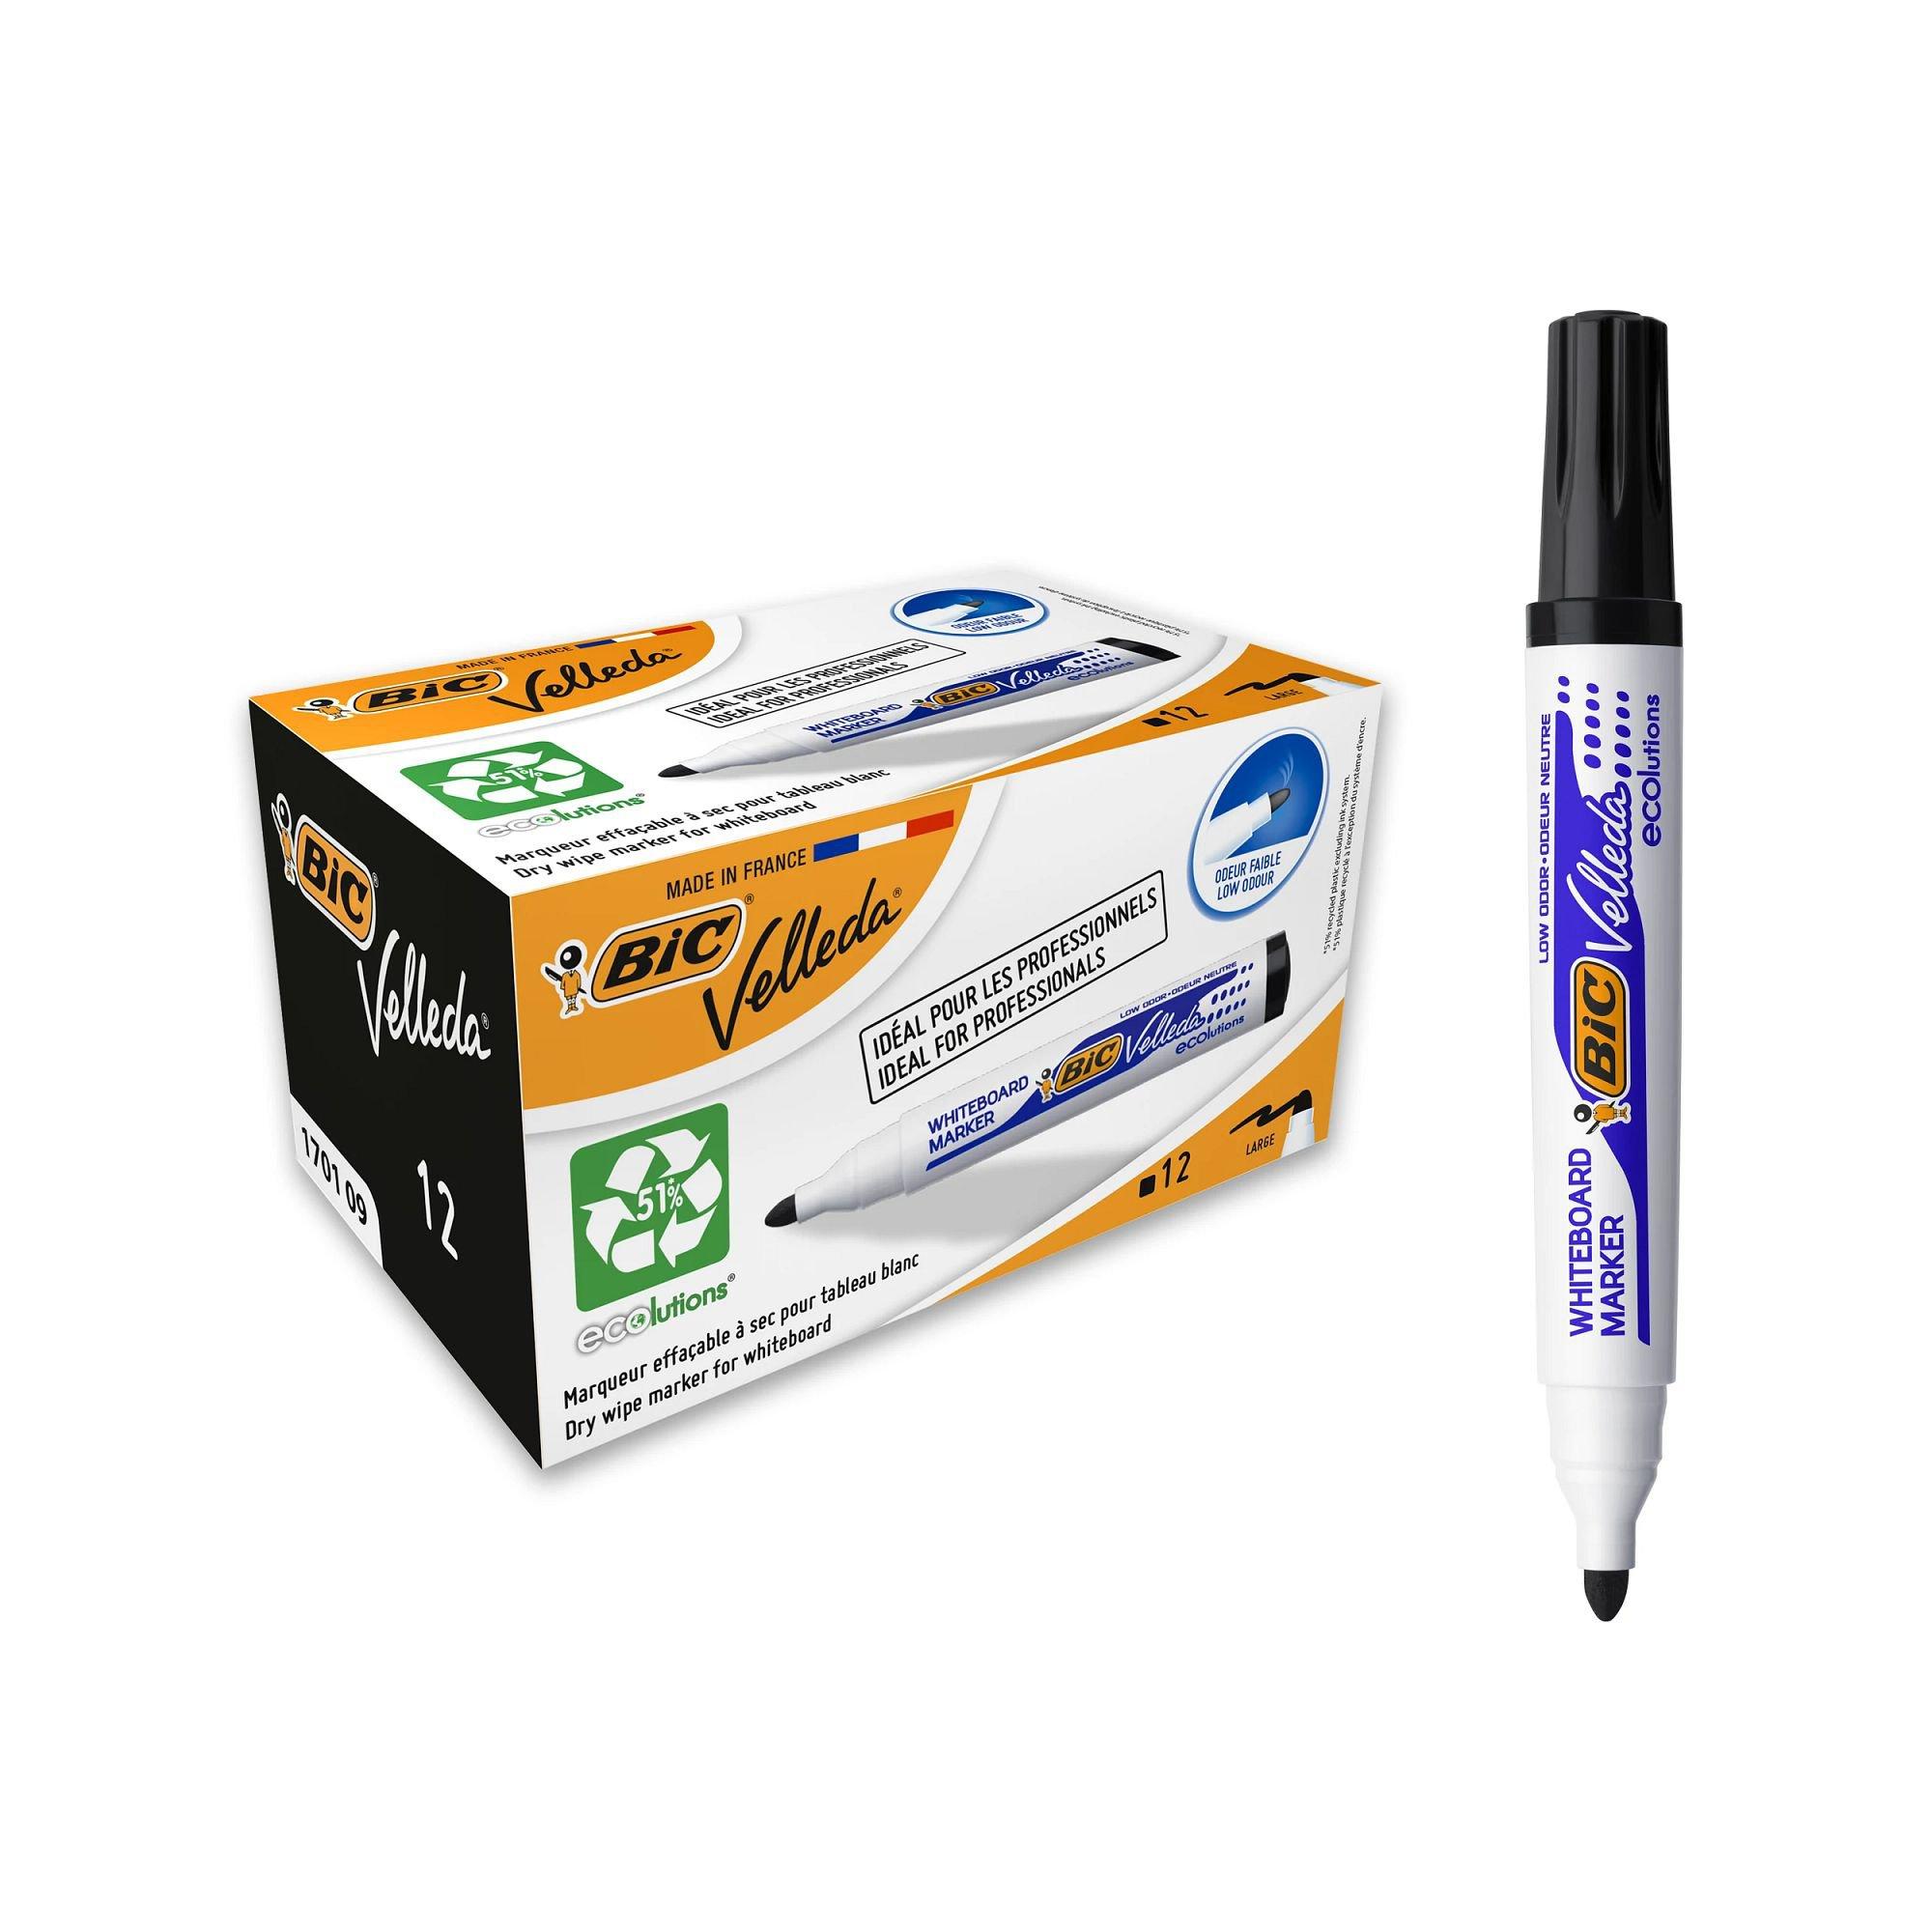 BIC Velleda Whiteboard Marker 1701 Bullet Tip Black 904937